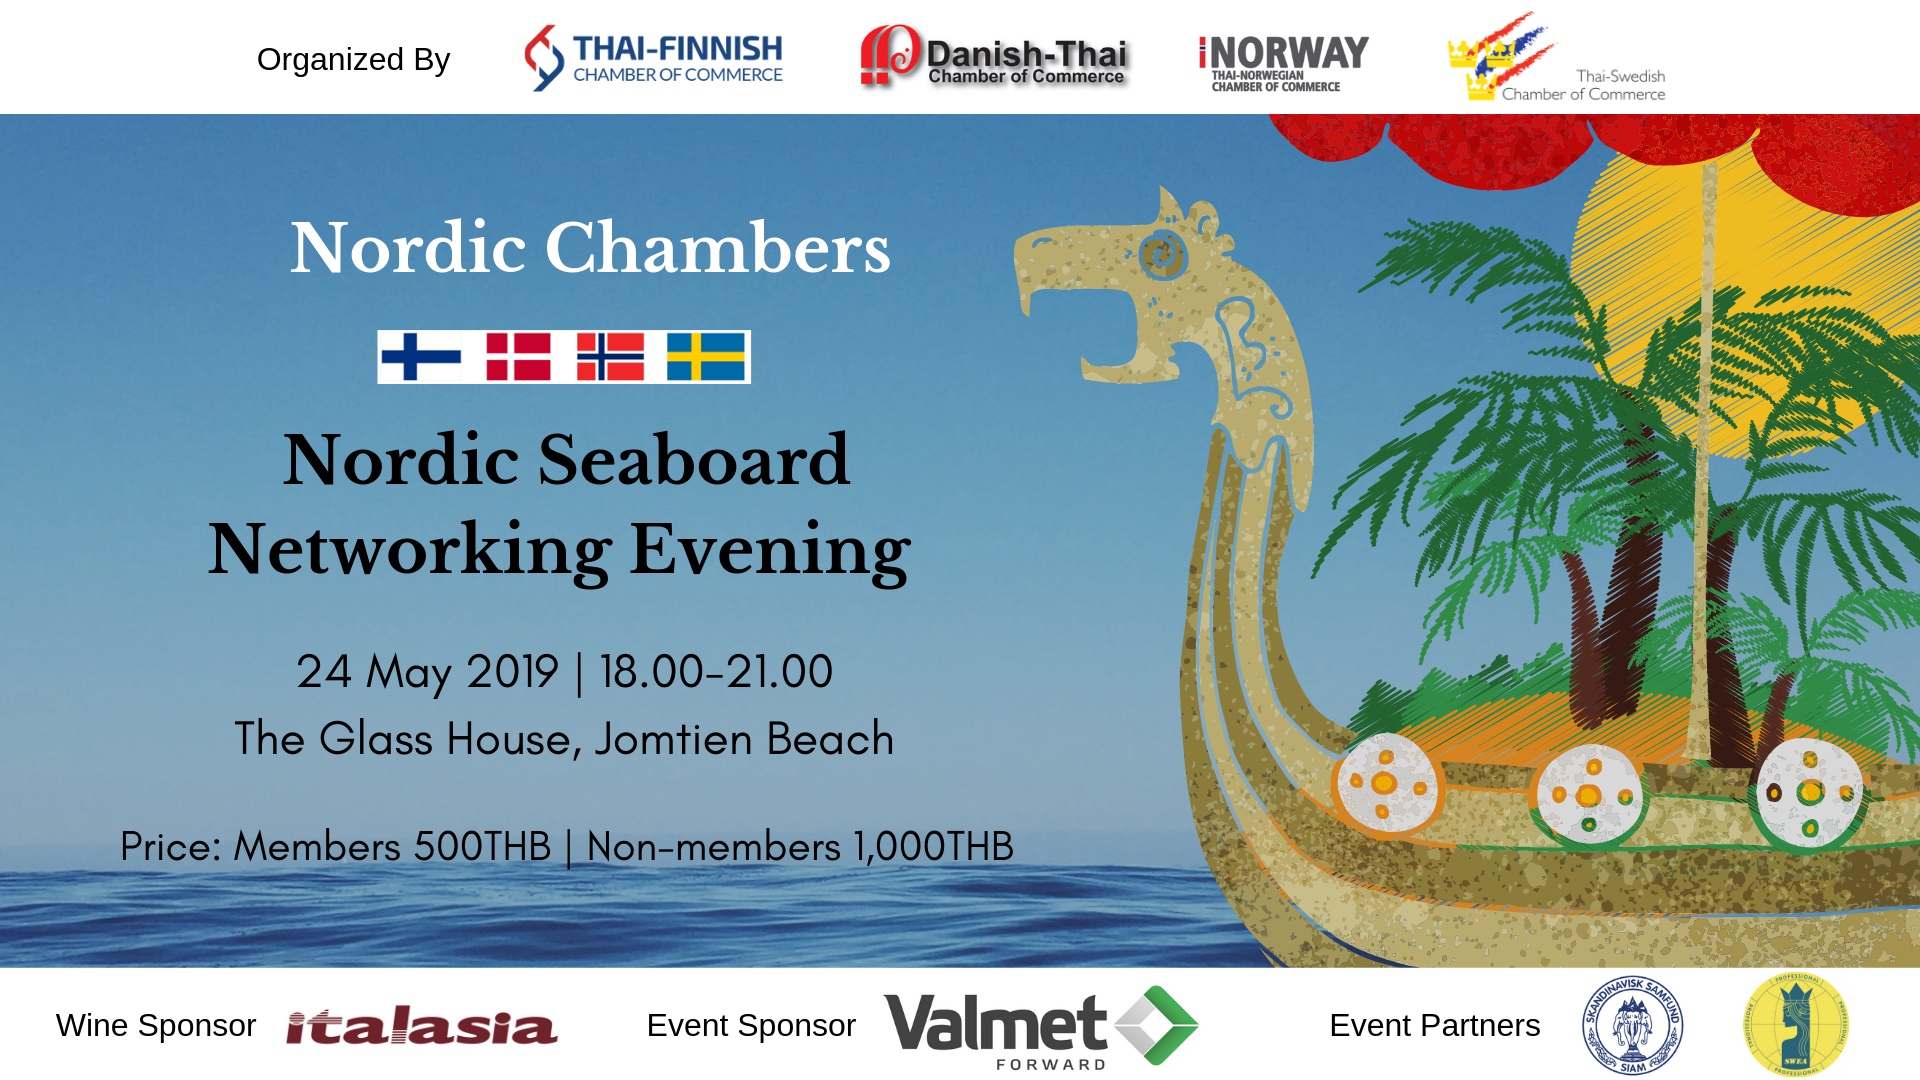 TFCC – Thai-Finnish Chamber of Commerce